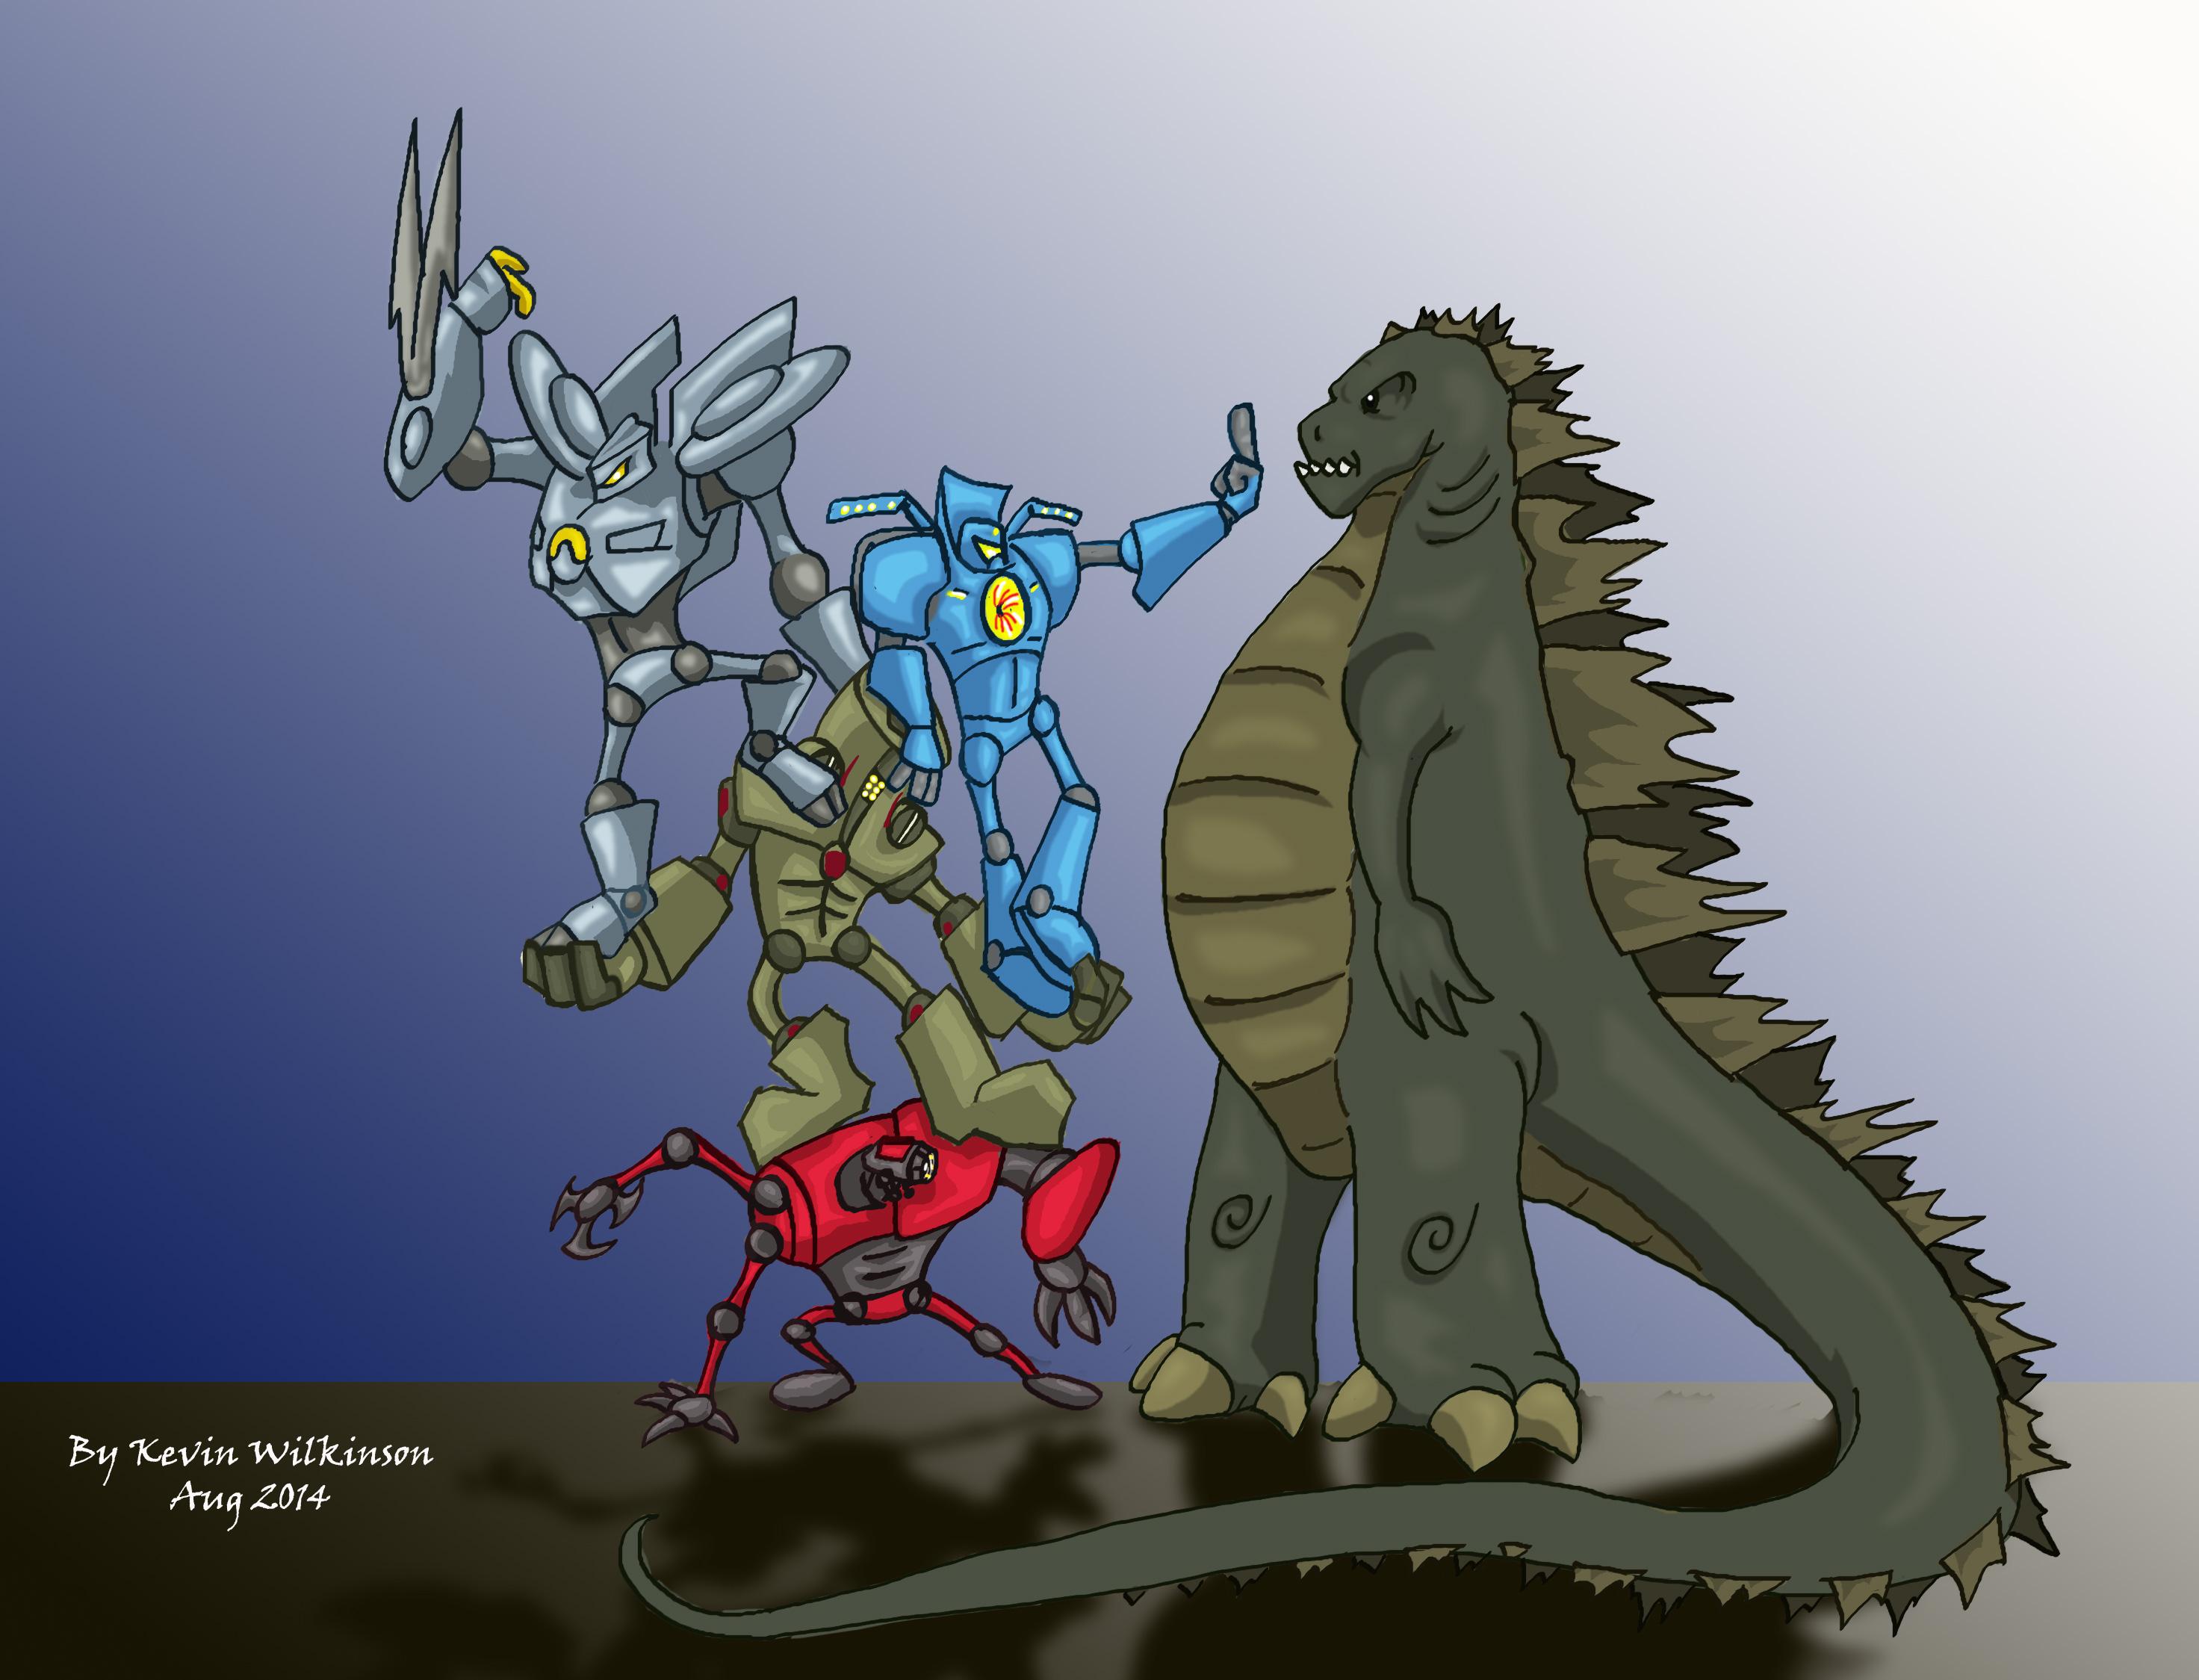 Pacific Rim Meets Godzilla